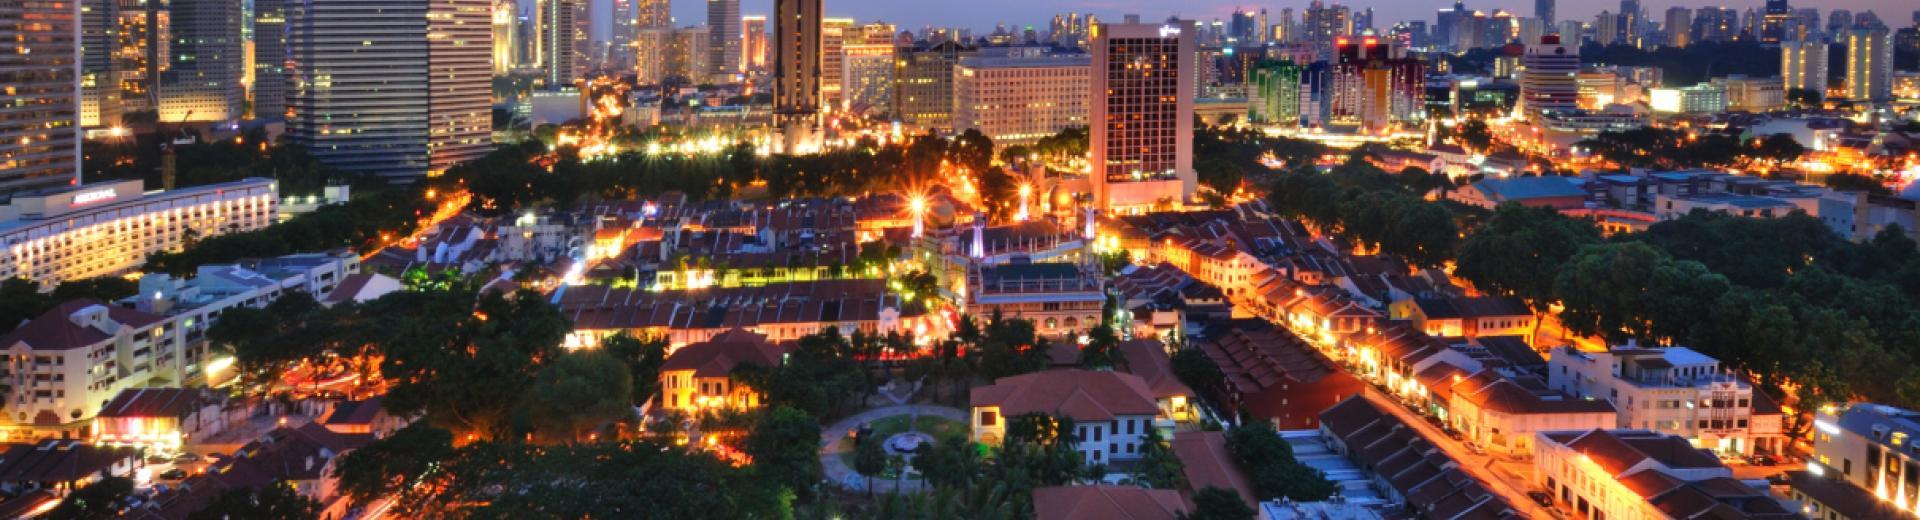 Singapore kampong